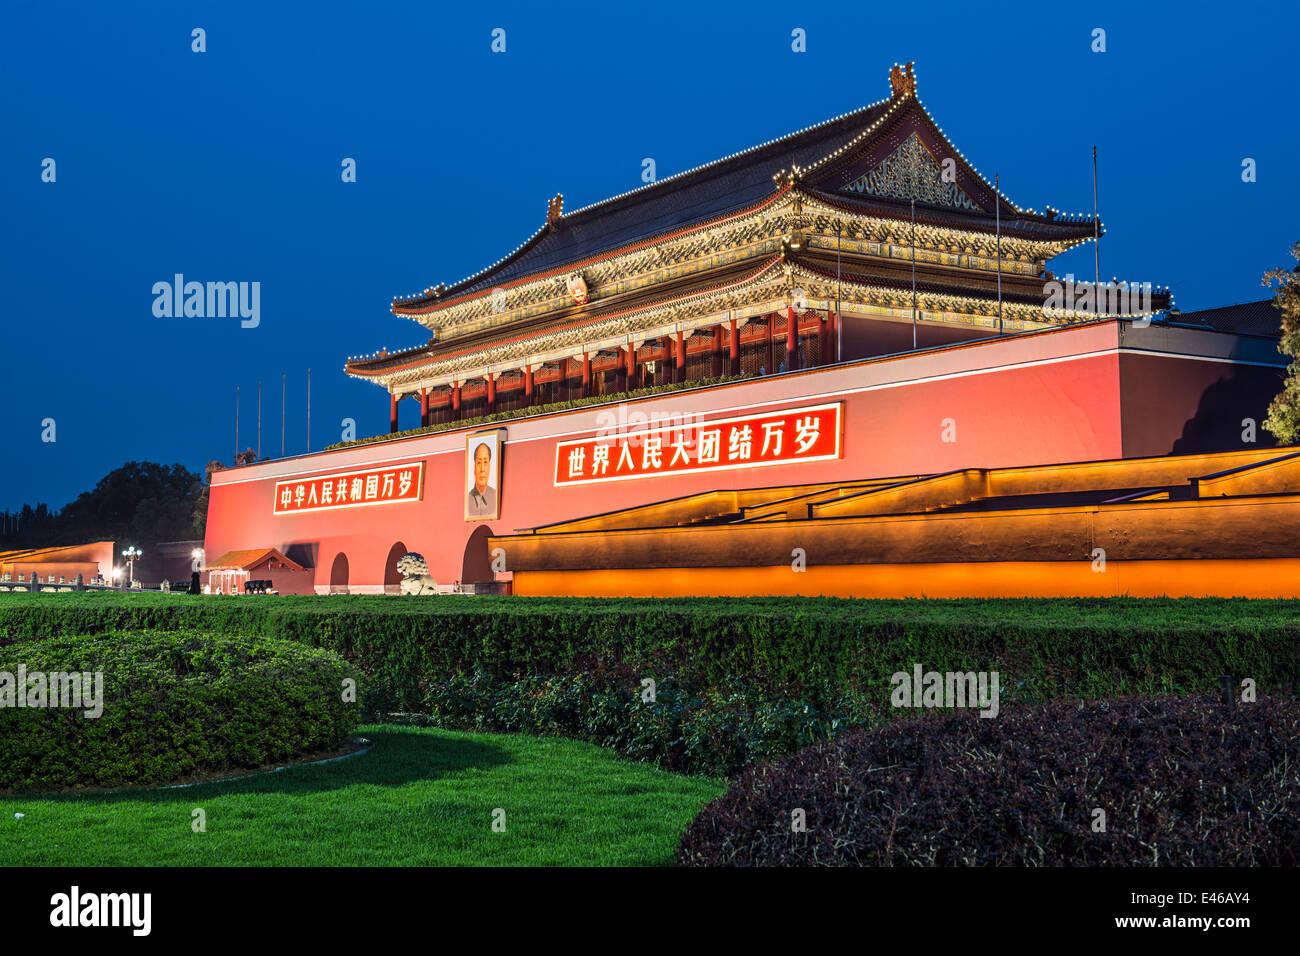 Tiananmen Square in Beijing, China. - Stock Image